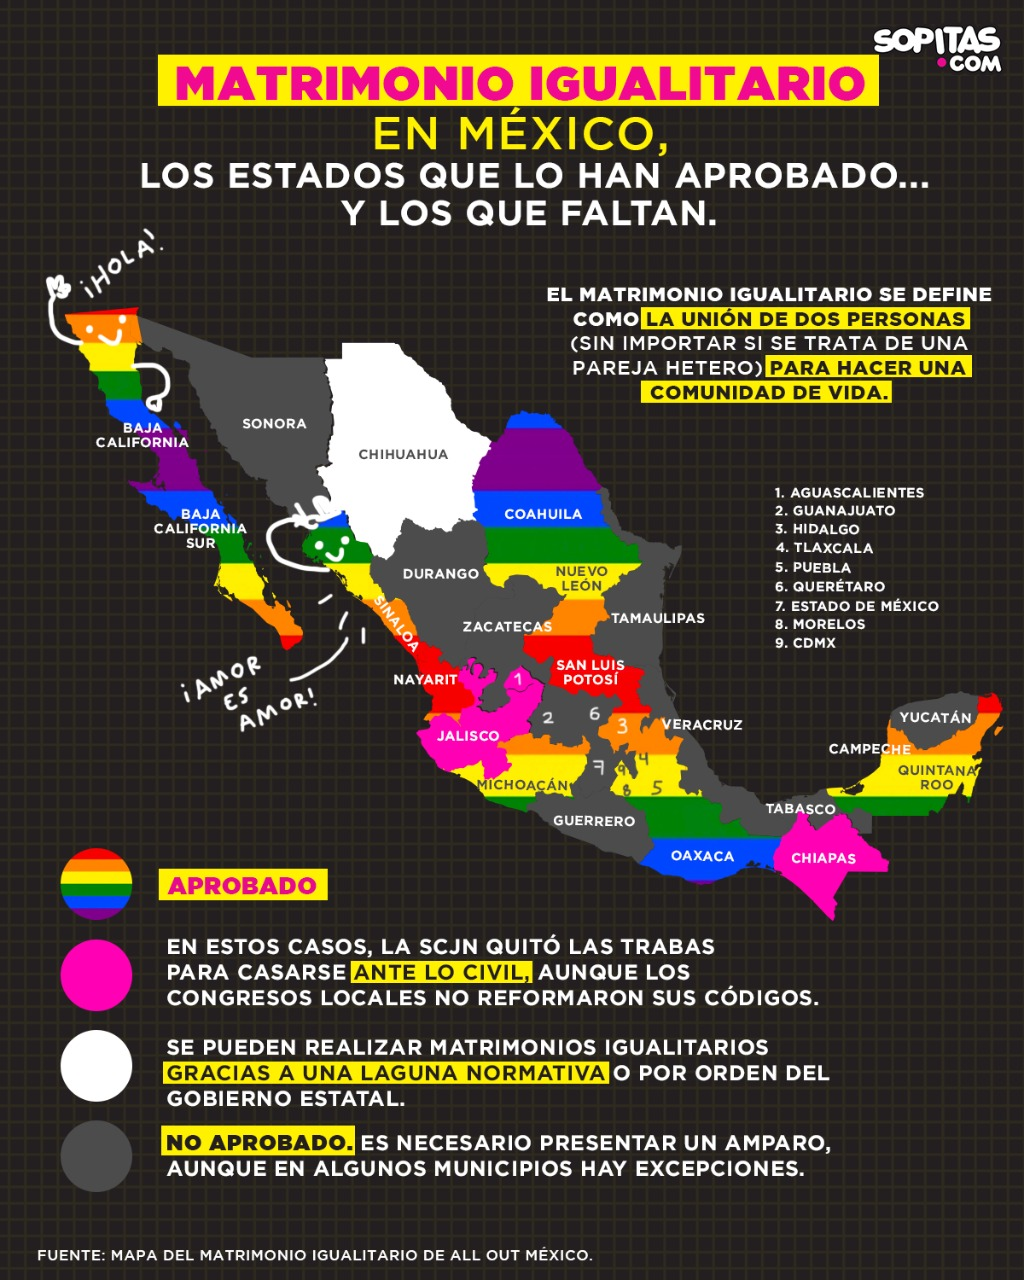 Matrimonio igualitario en México